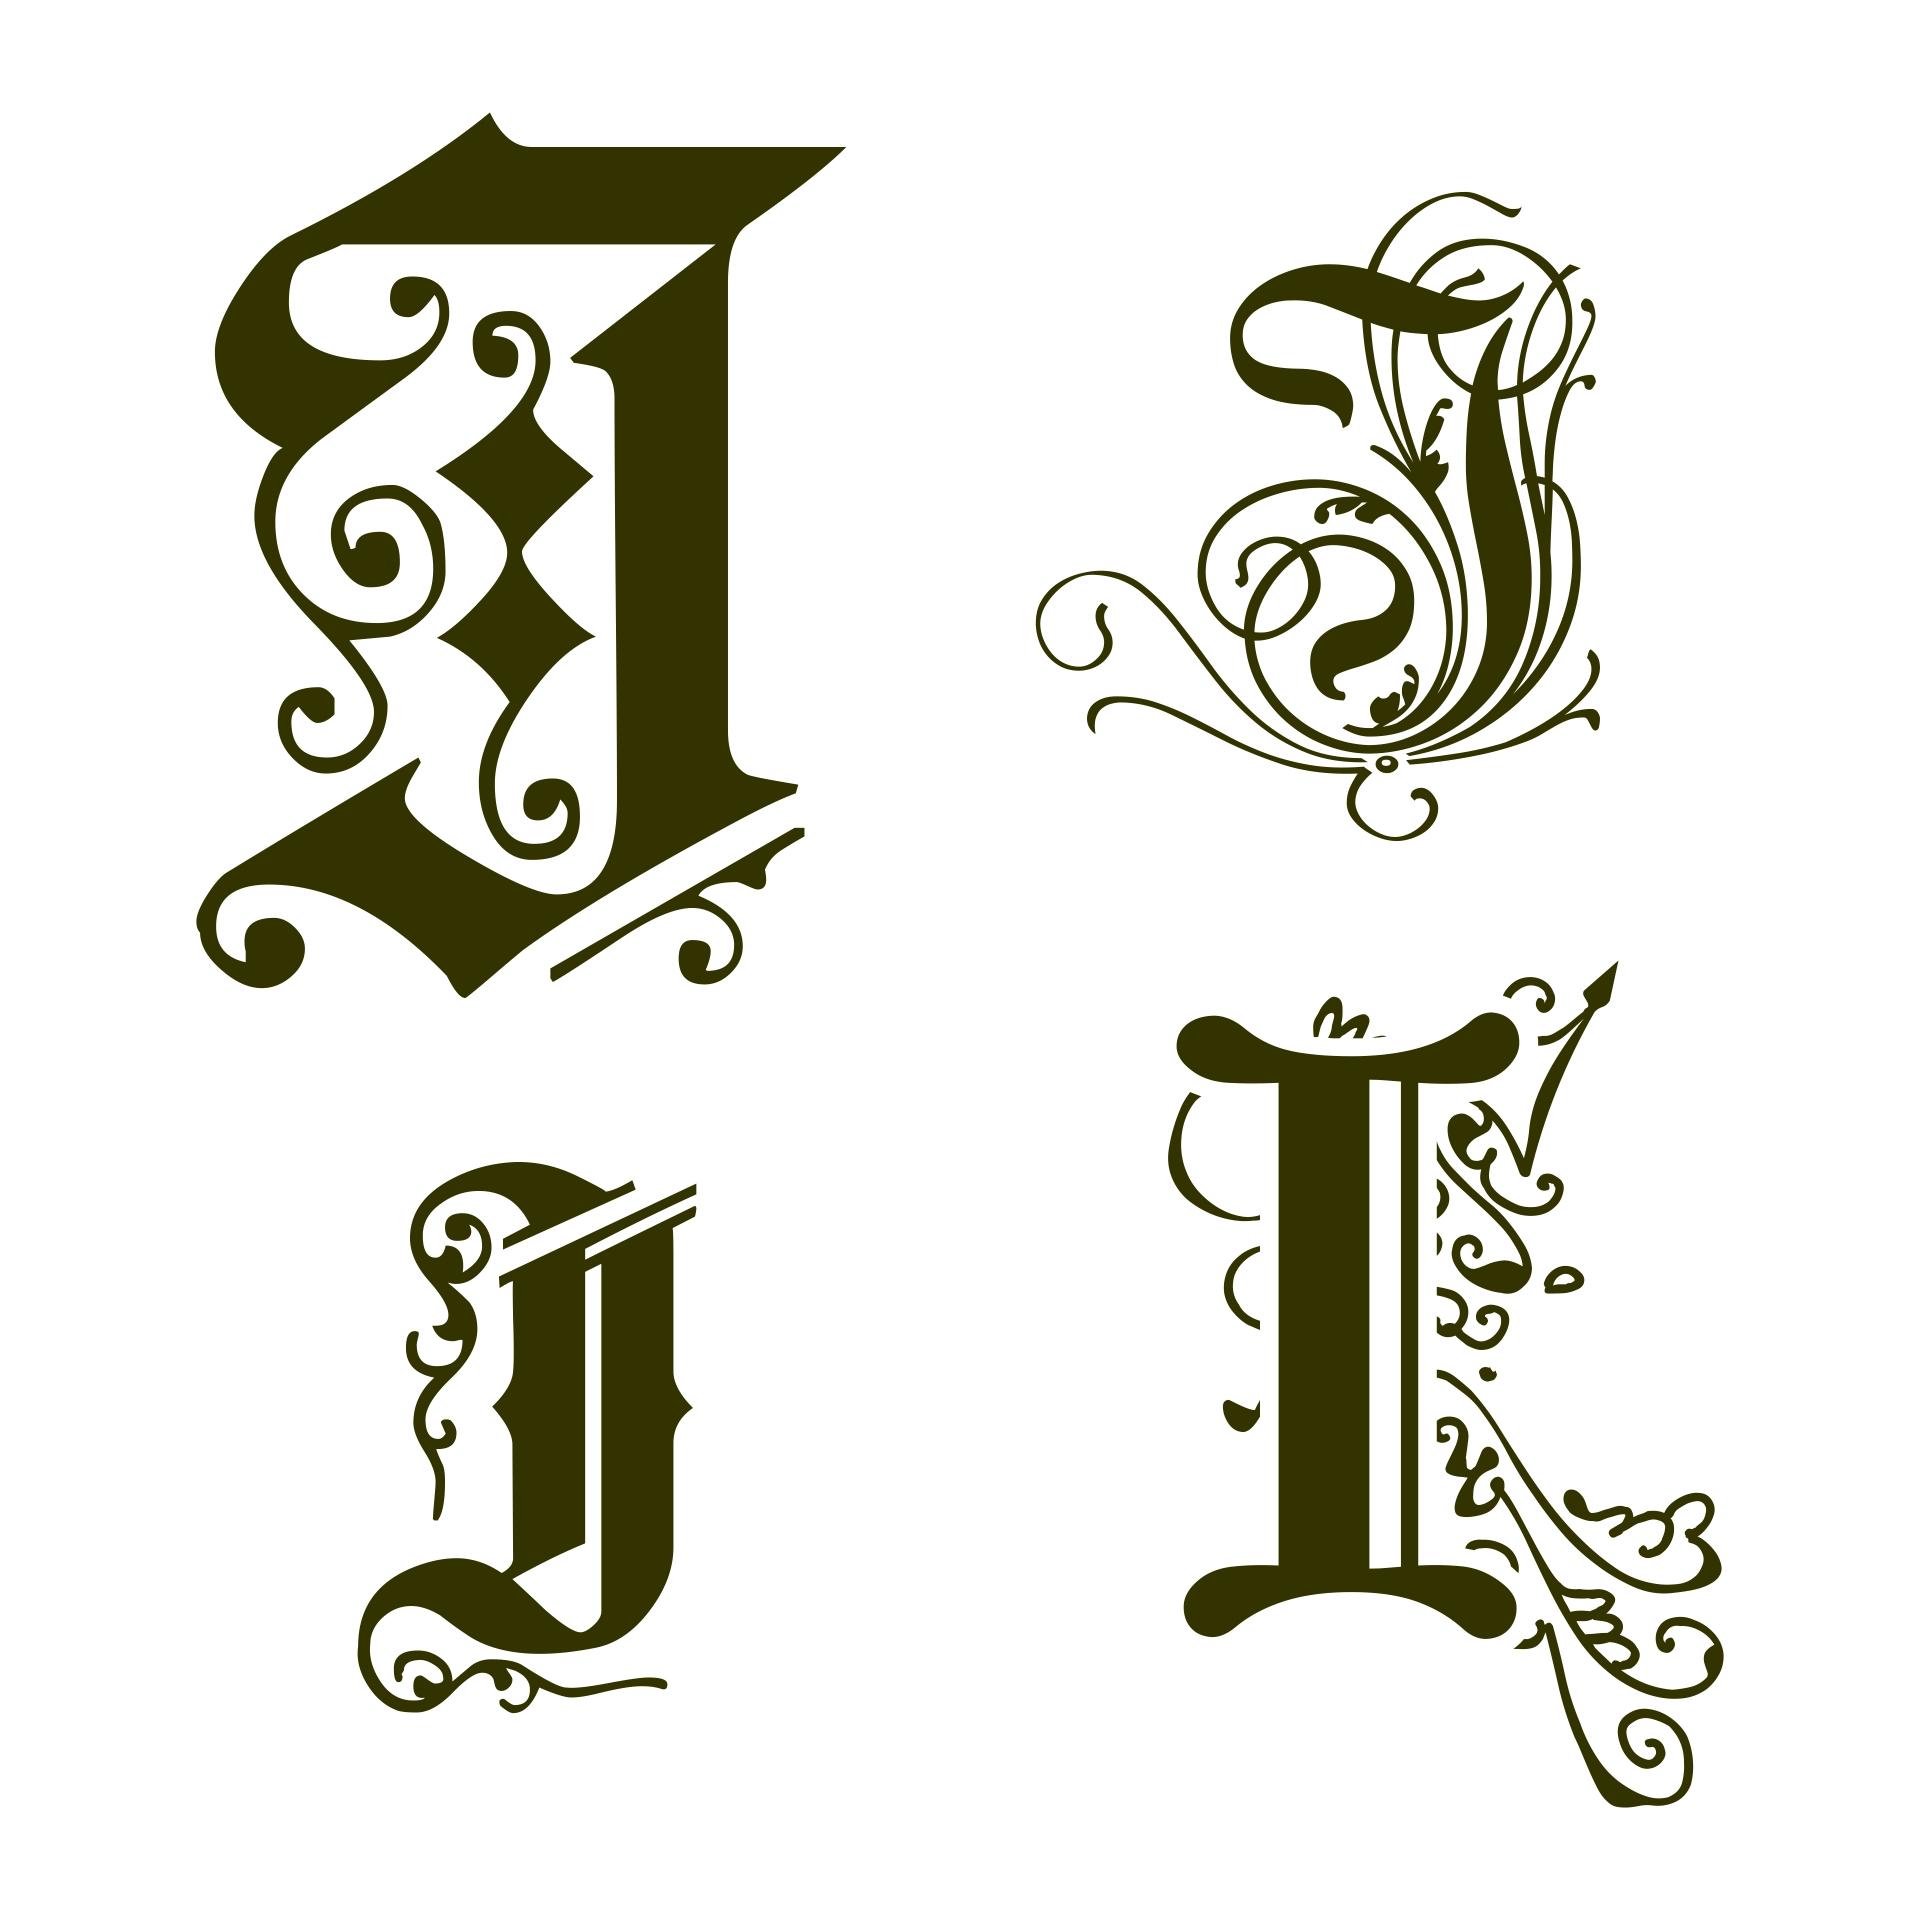 Illuminated Manuscript Letter I